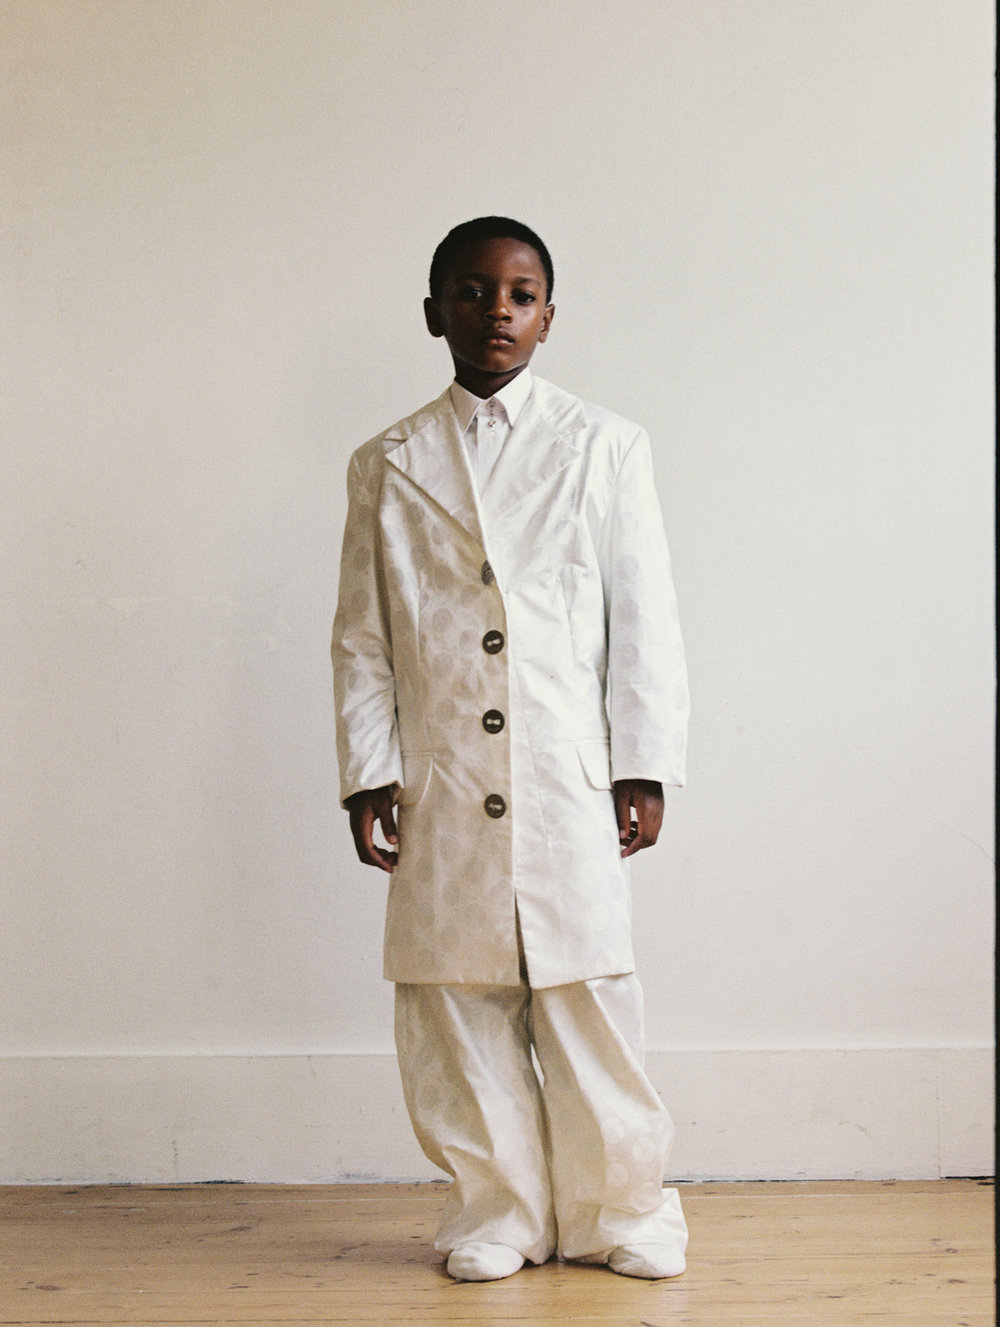 Isaiah wears Super Yaya jacket, stylist's own shirt, Slim Barrett earrings (worn on collar)